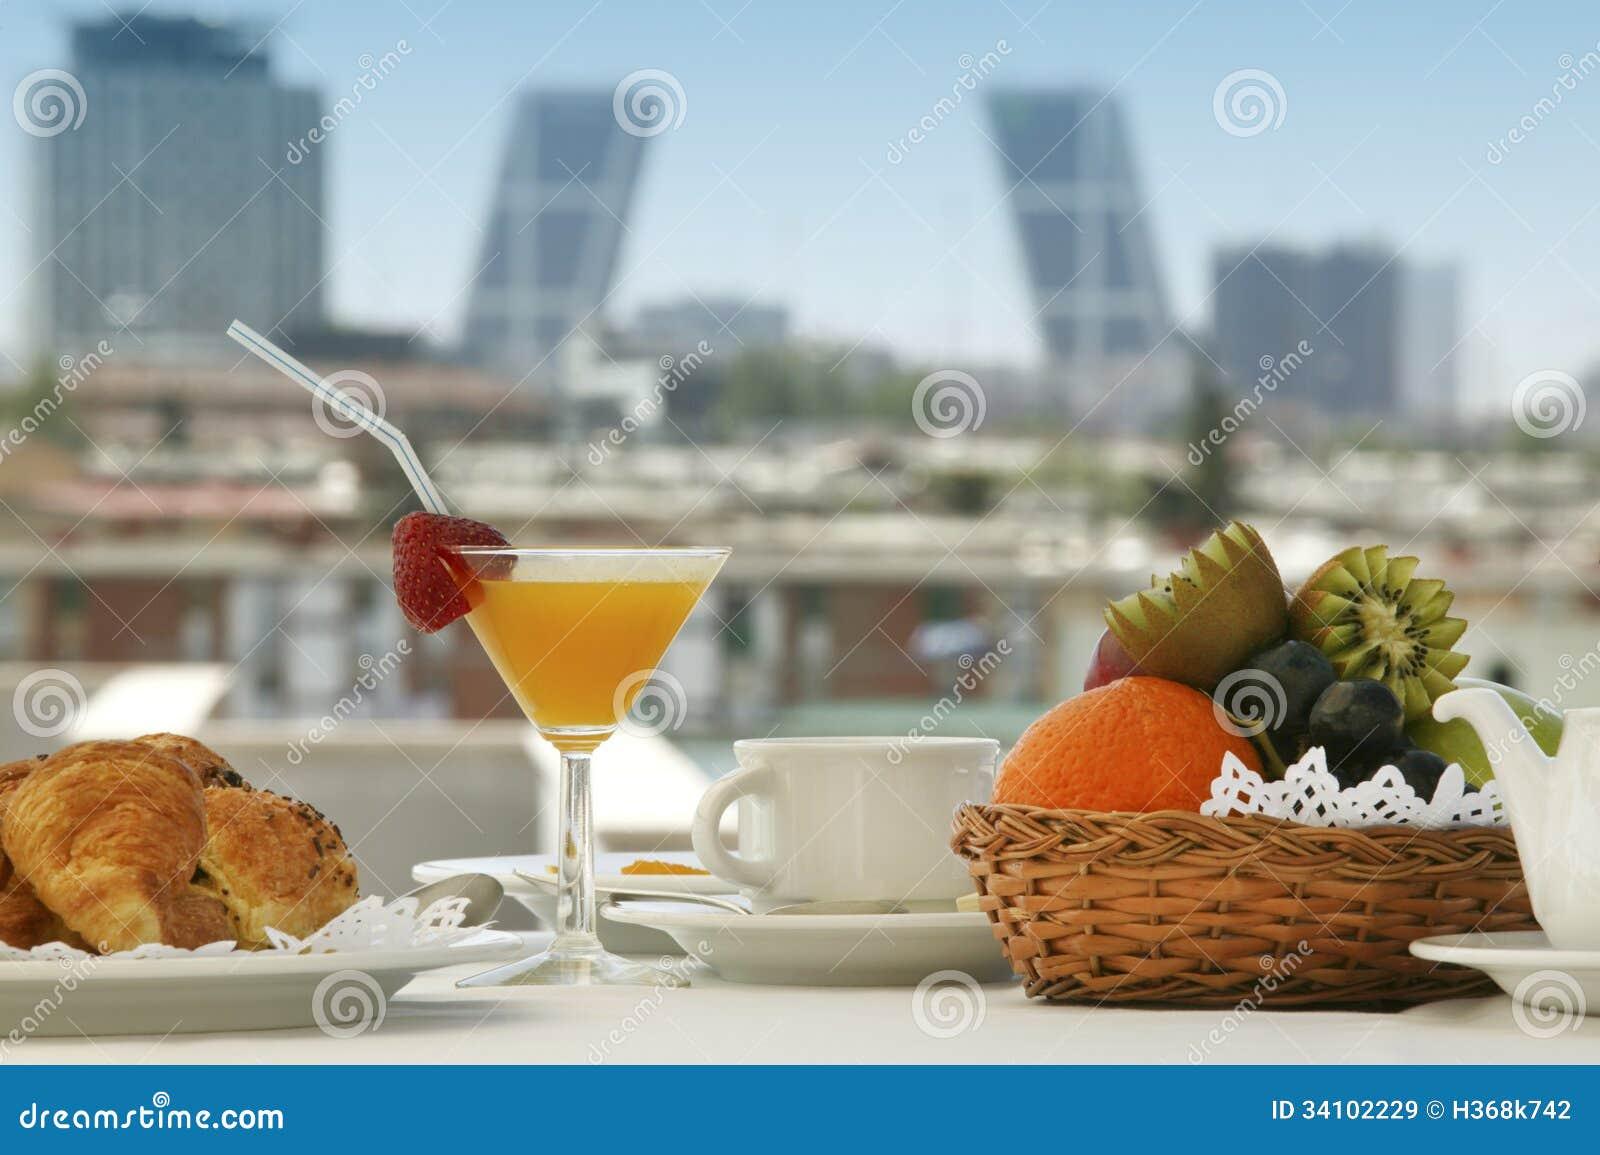 Breakfast in a terrace royalty free stock images image for Breakfast terrace